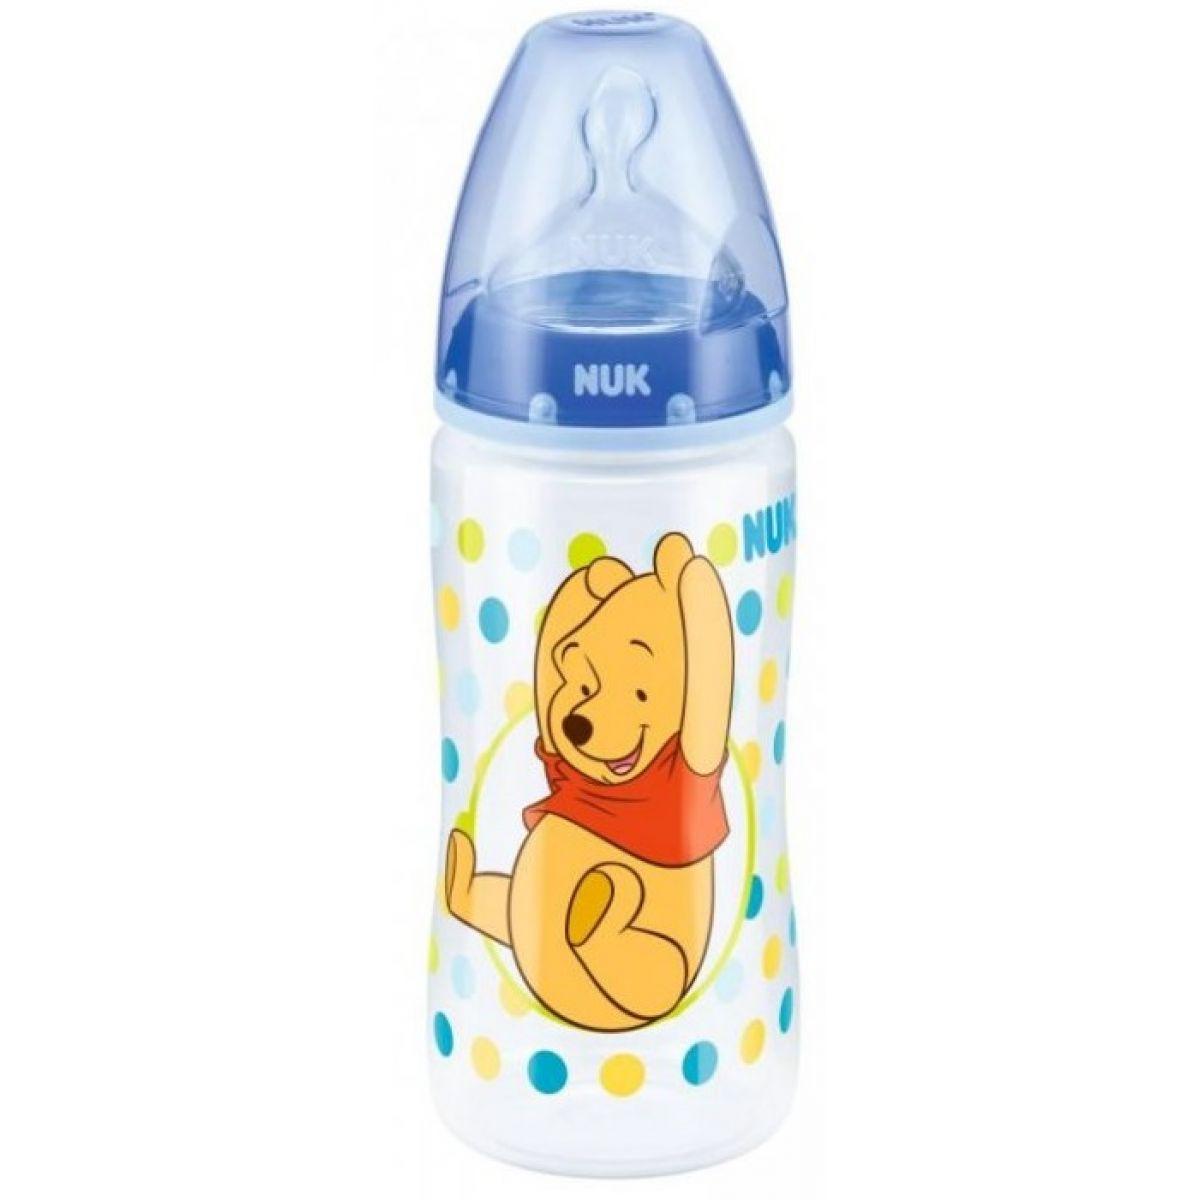 Nuk FC fľaša PP Disney Medvedík Pú 300ml